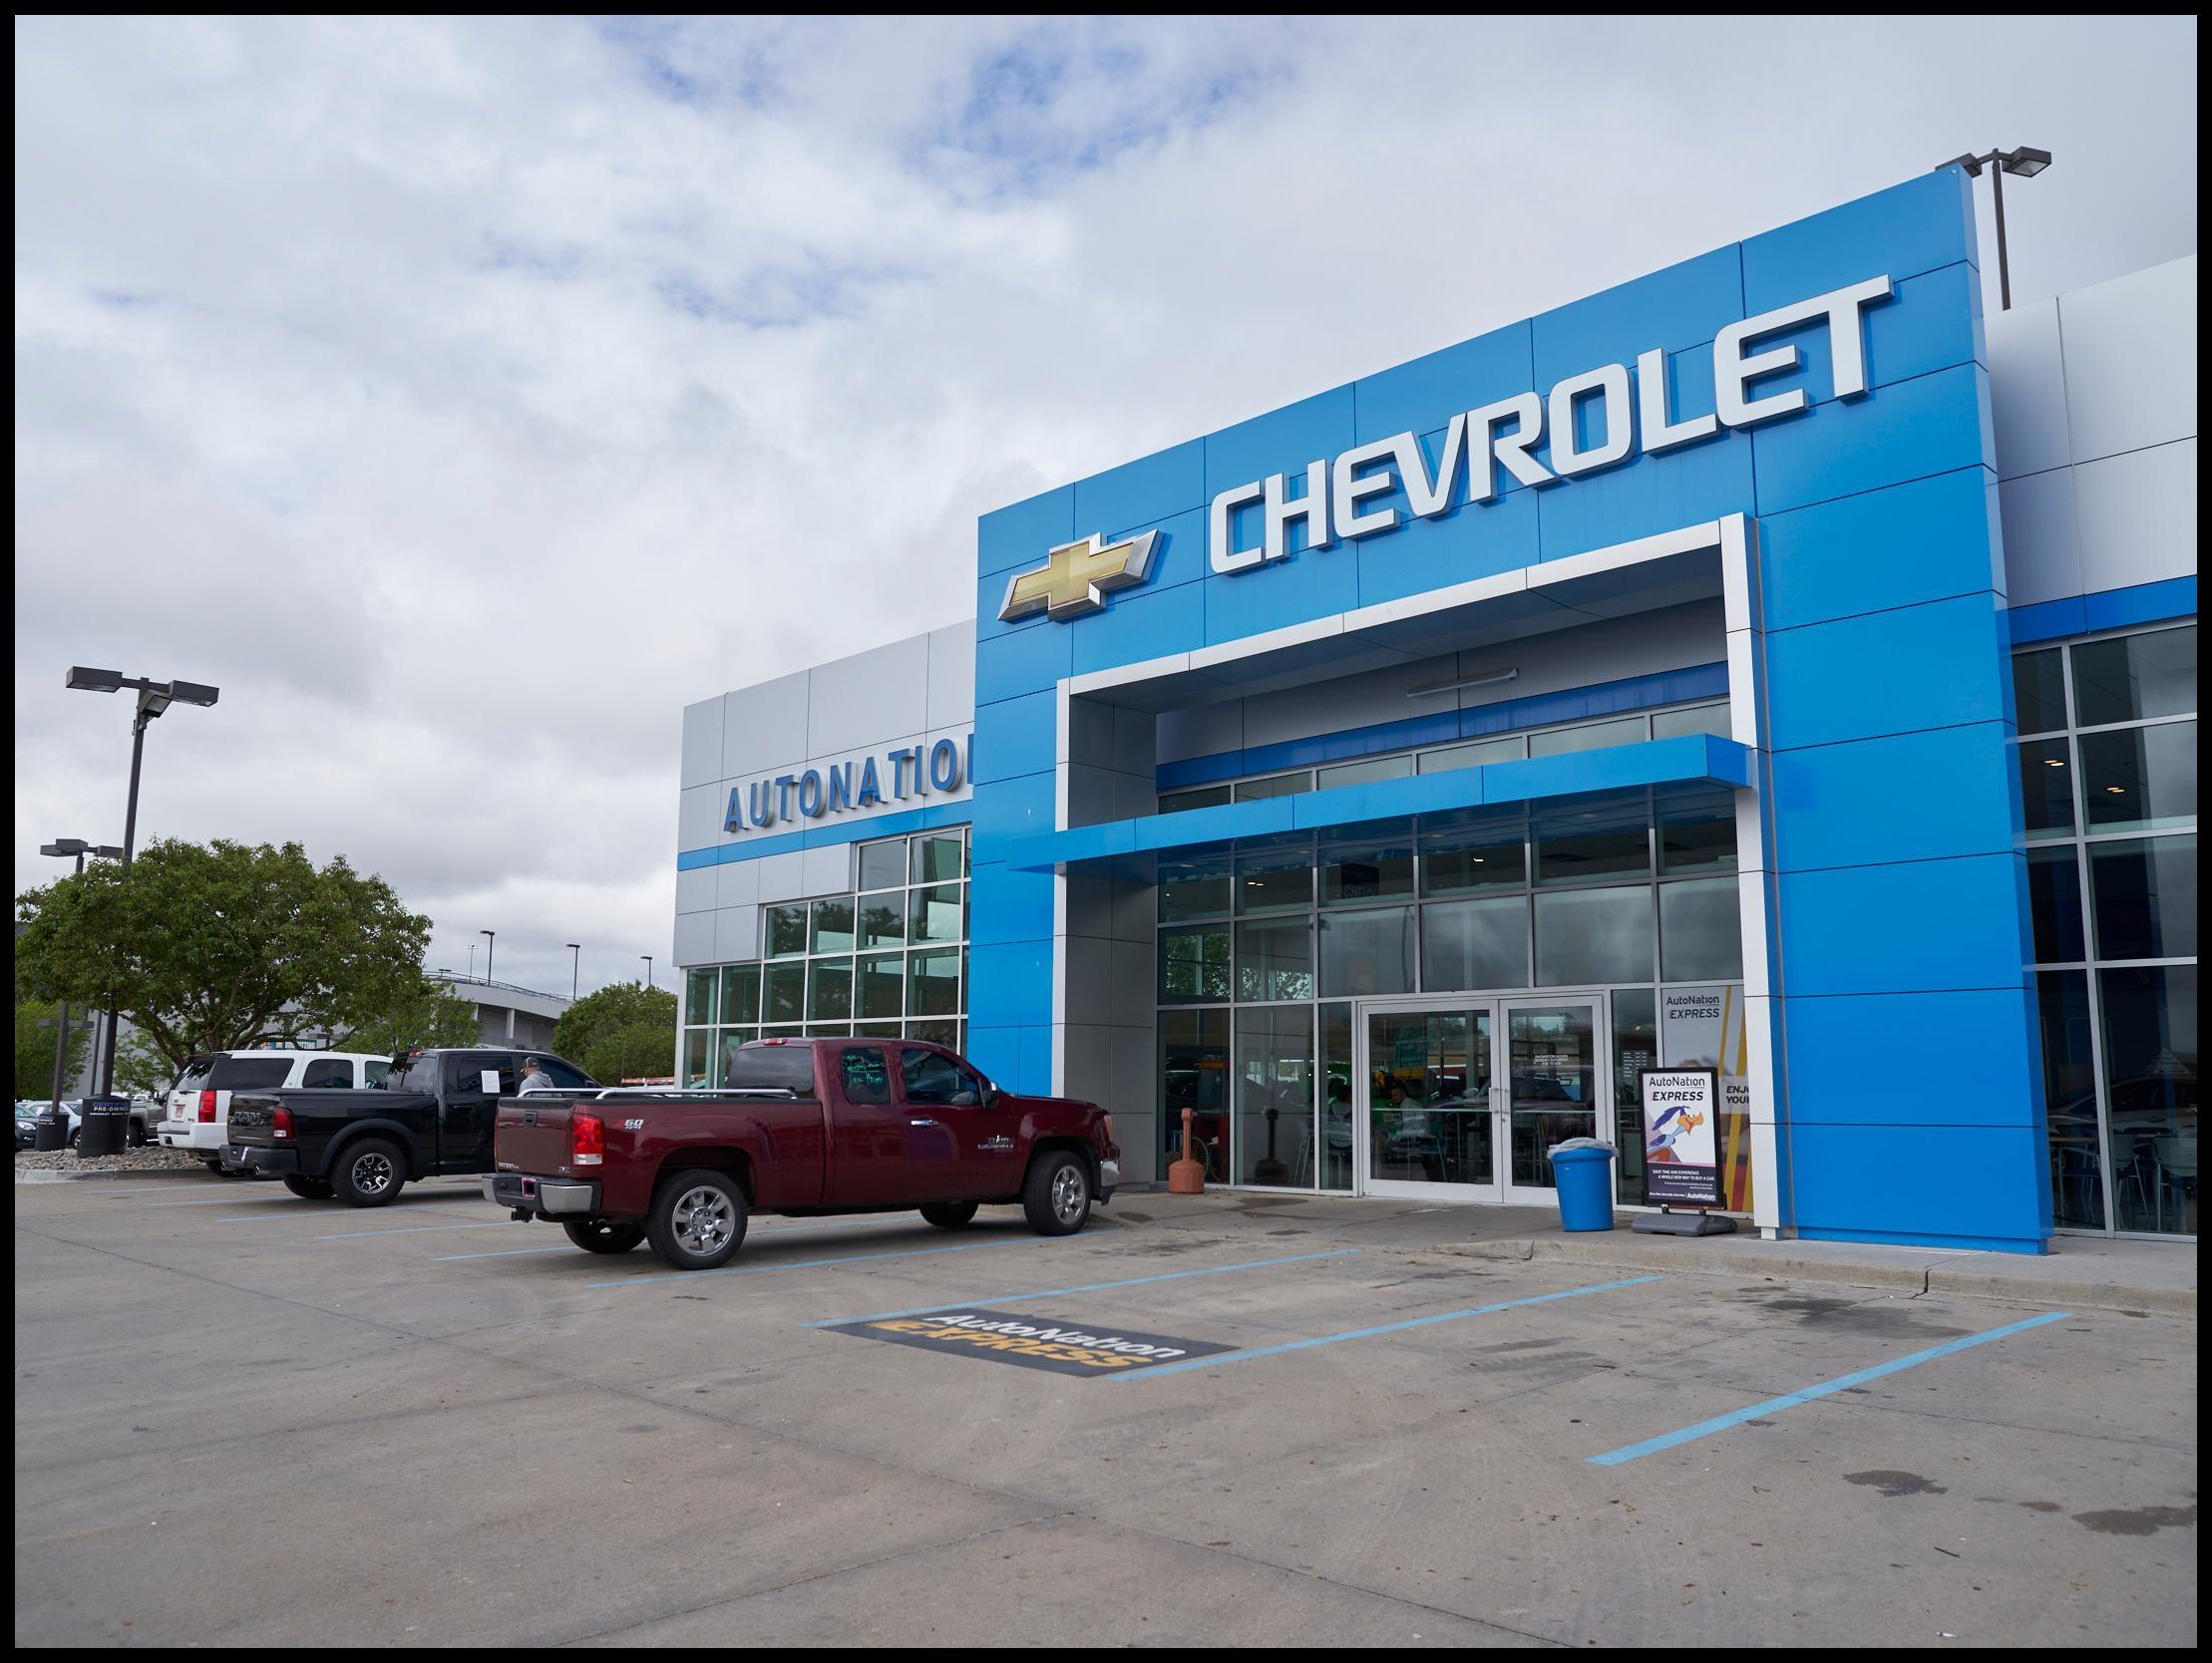 AutoNation Chevrolet North in Denver